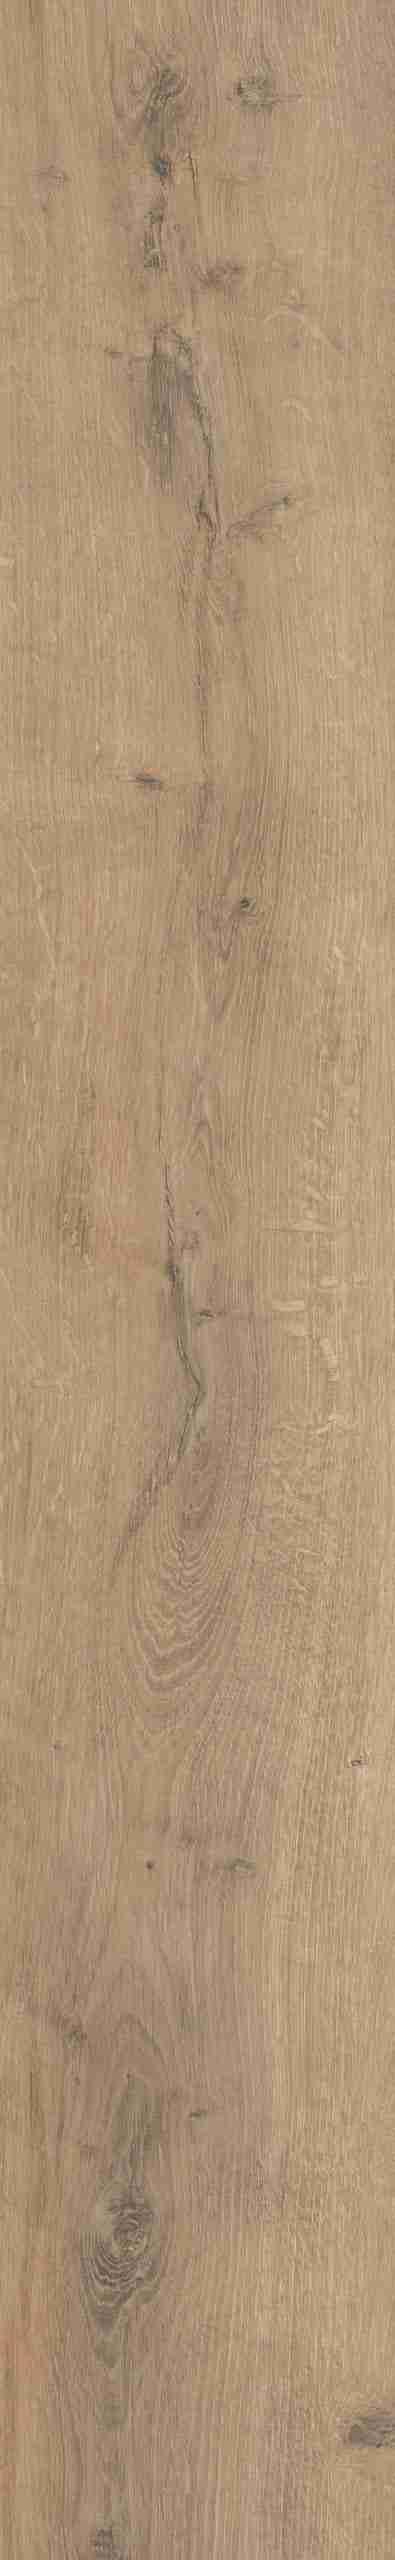 Continental oak lifestyle 2